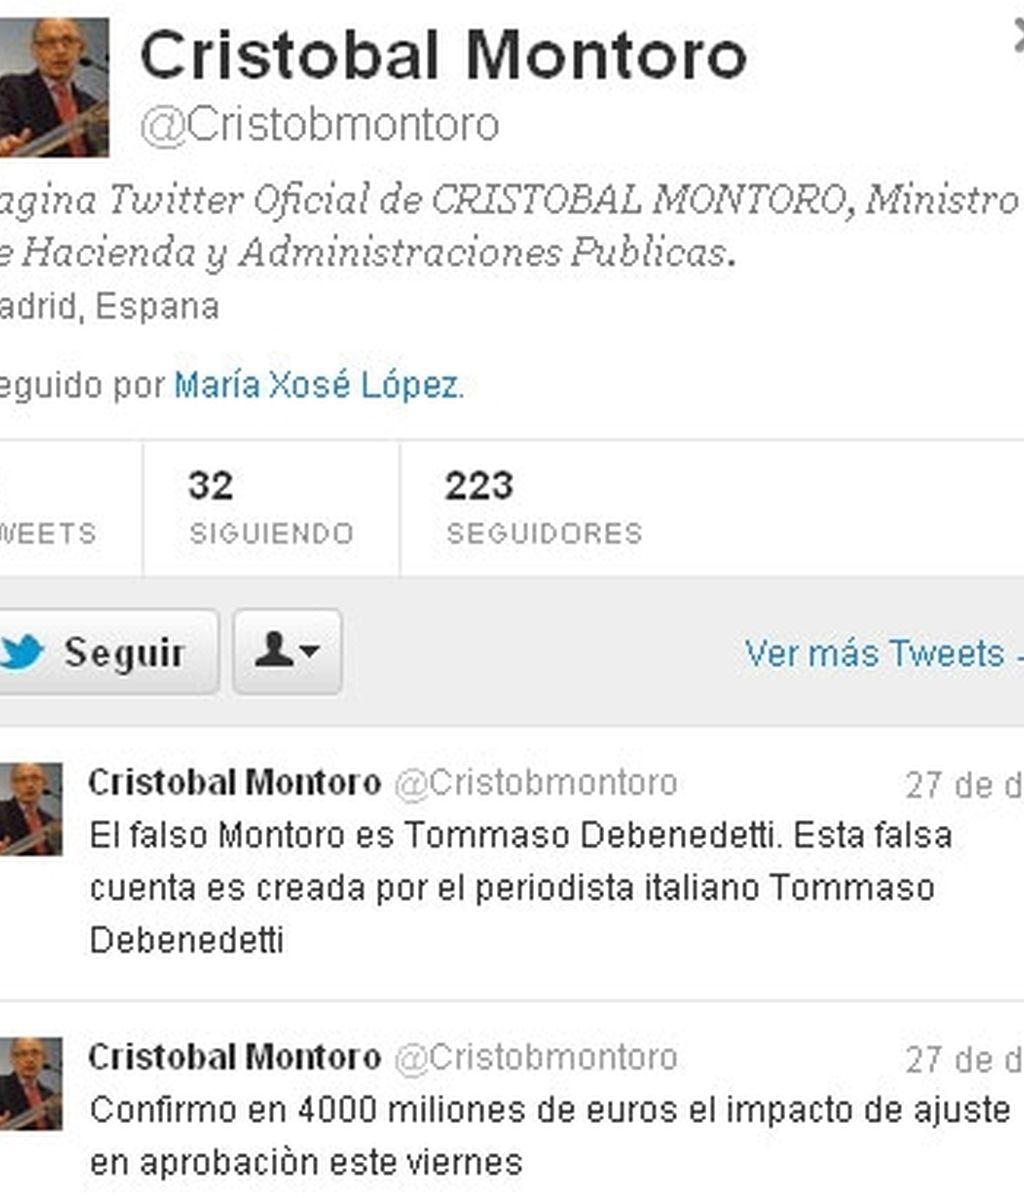 La falsa cuenta en Twitter de Cristóbal Montoro.